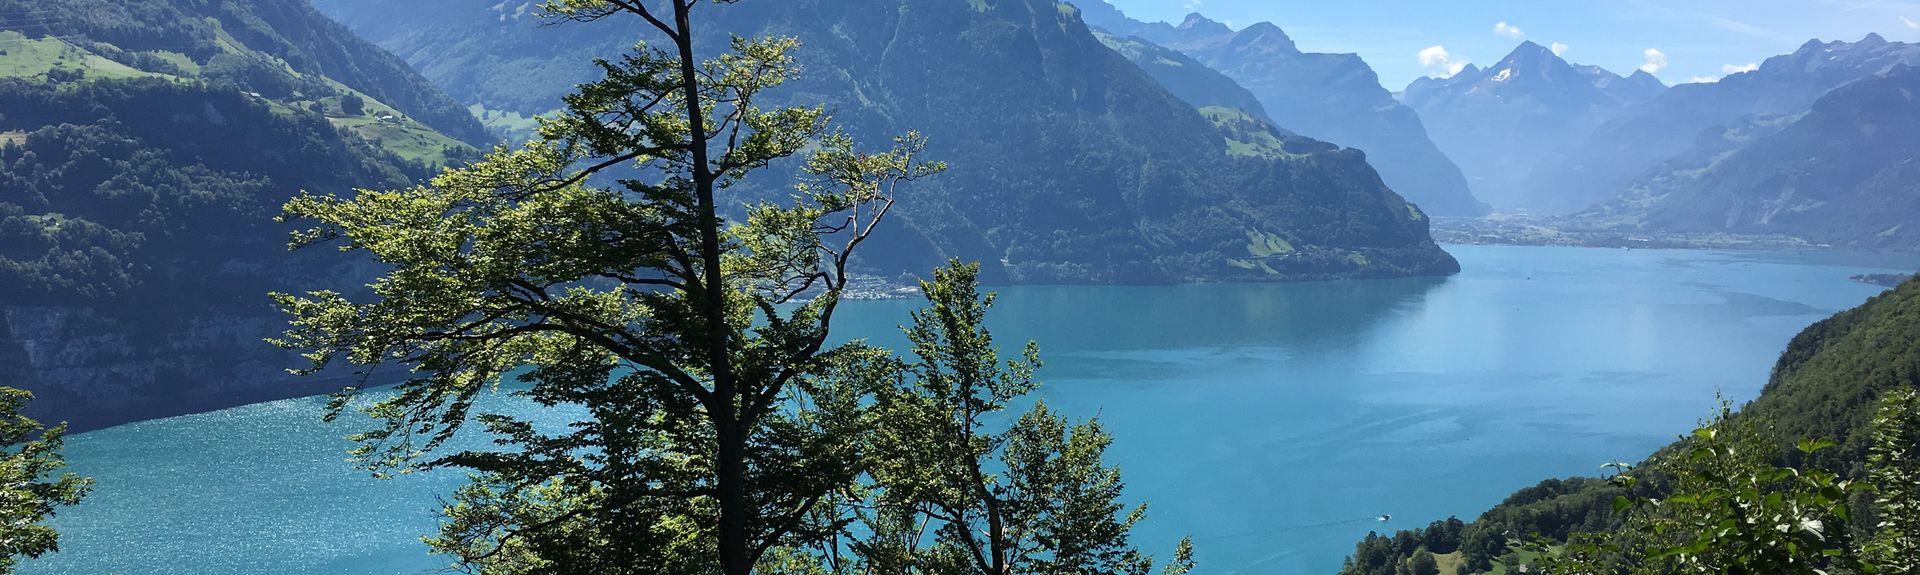 Cheselen Ski Lift, Kerns, Switzerland